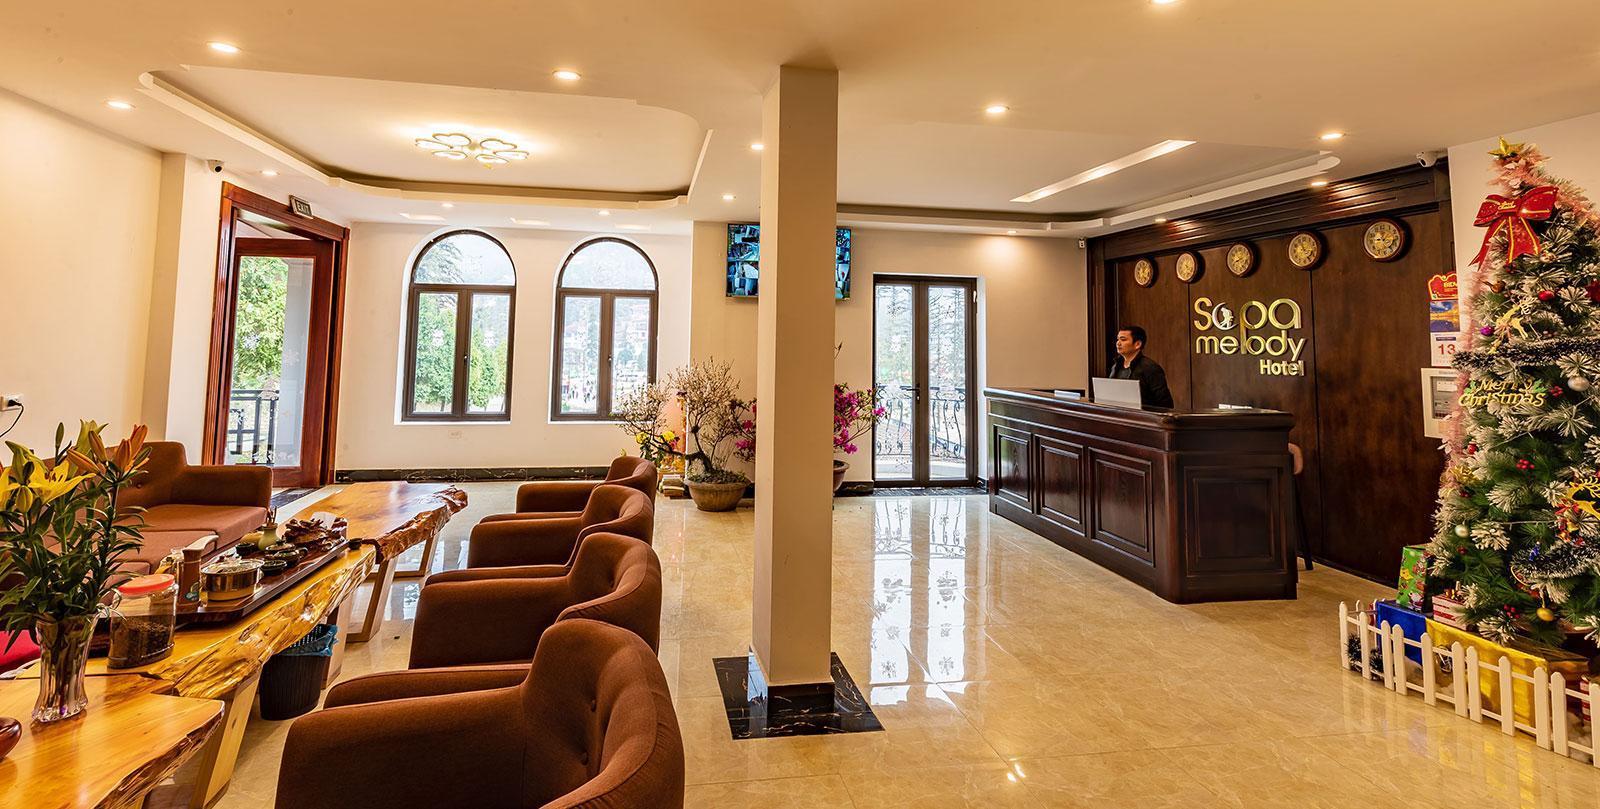 Melody Sapa Hotel